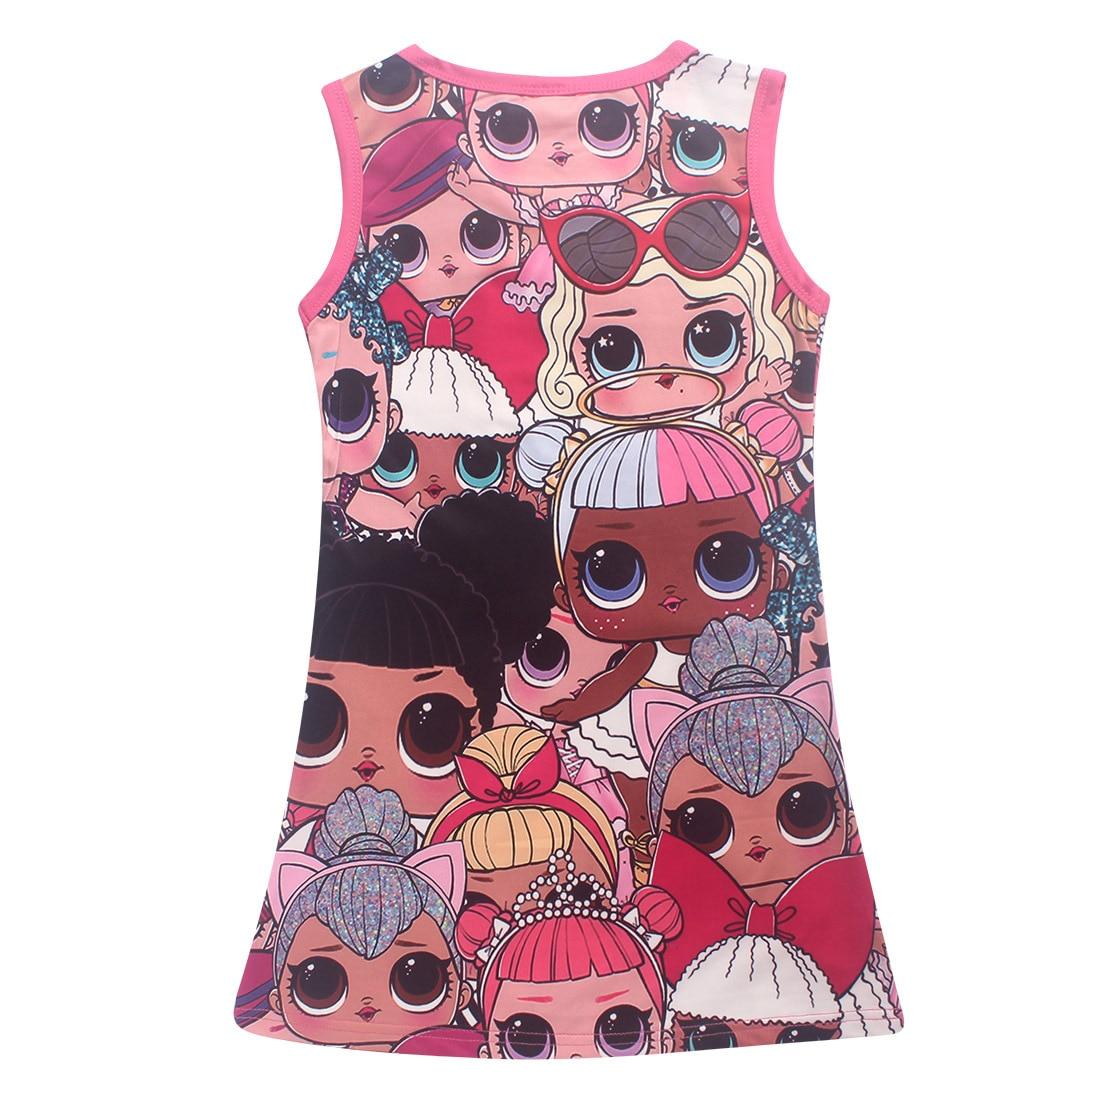 2018 children summer dress sweet dress cartoon doll Ball Gown baby girl clothes girls dress baby girl clothes lol roblox